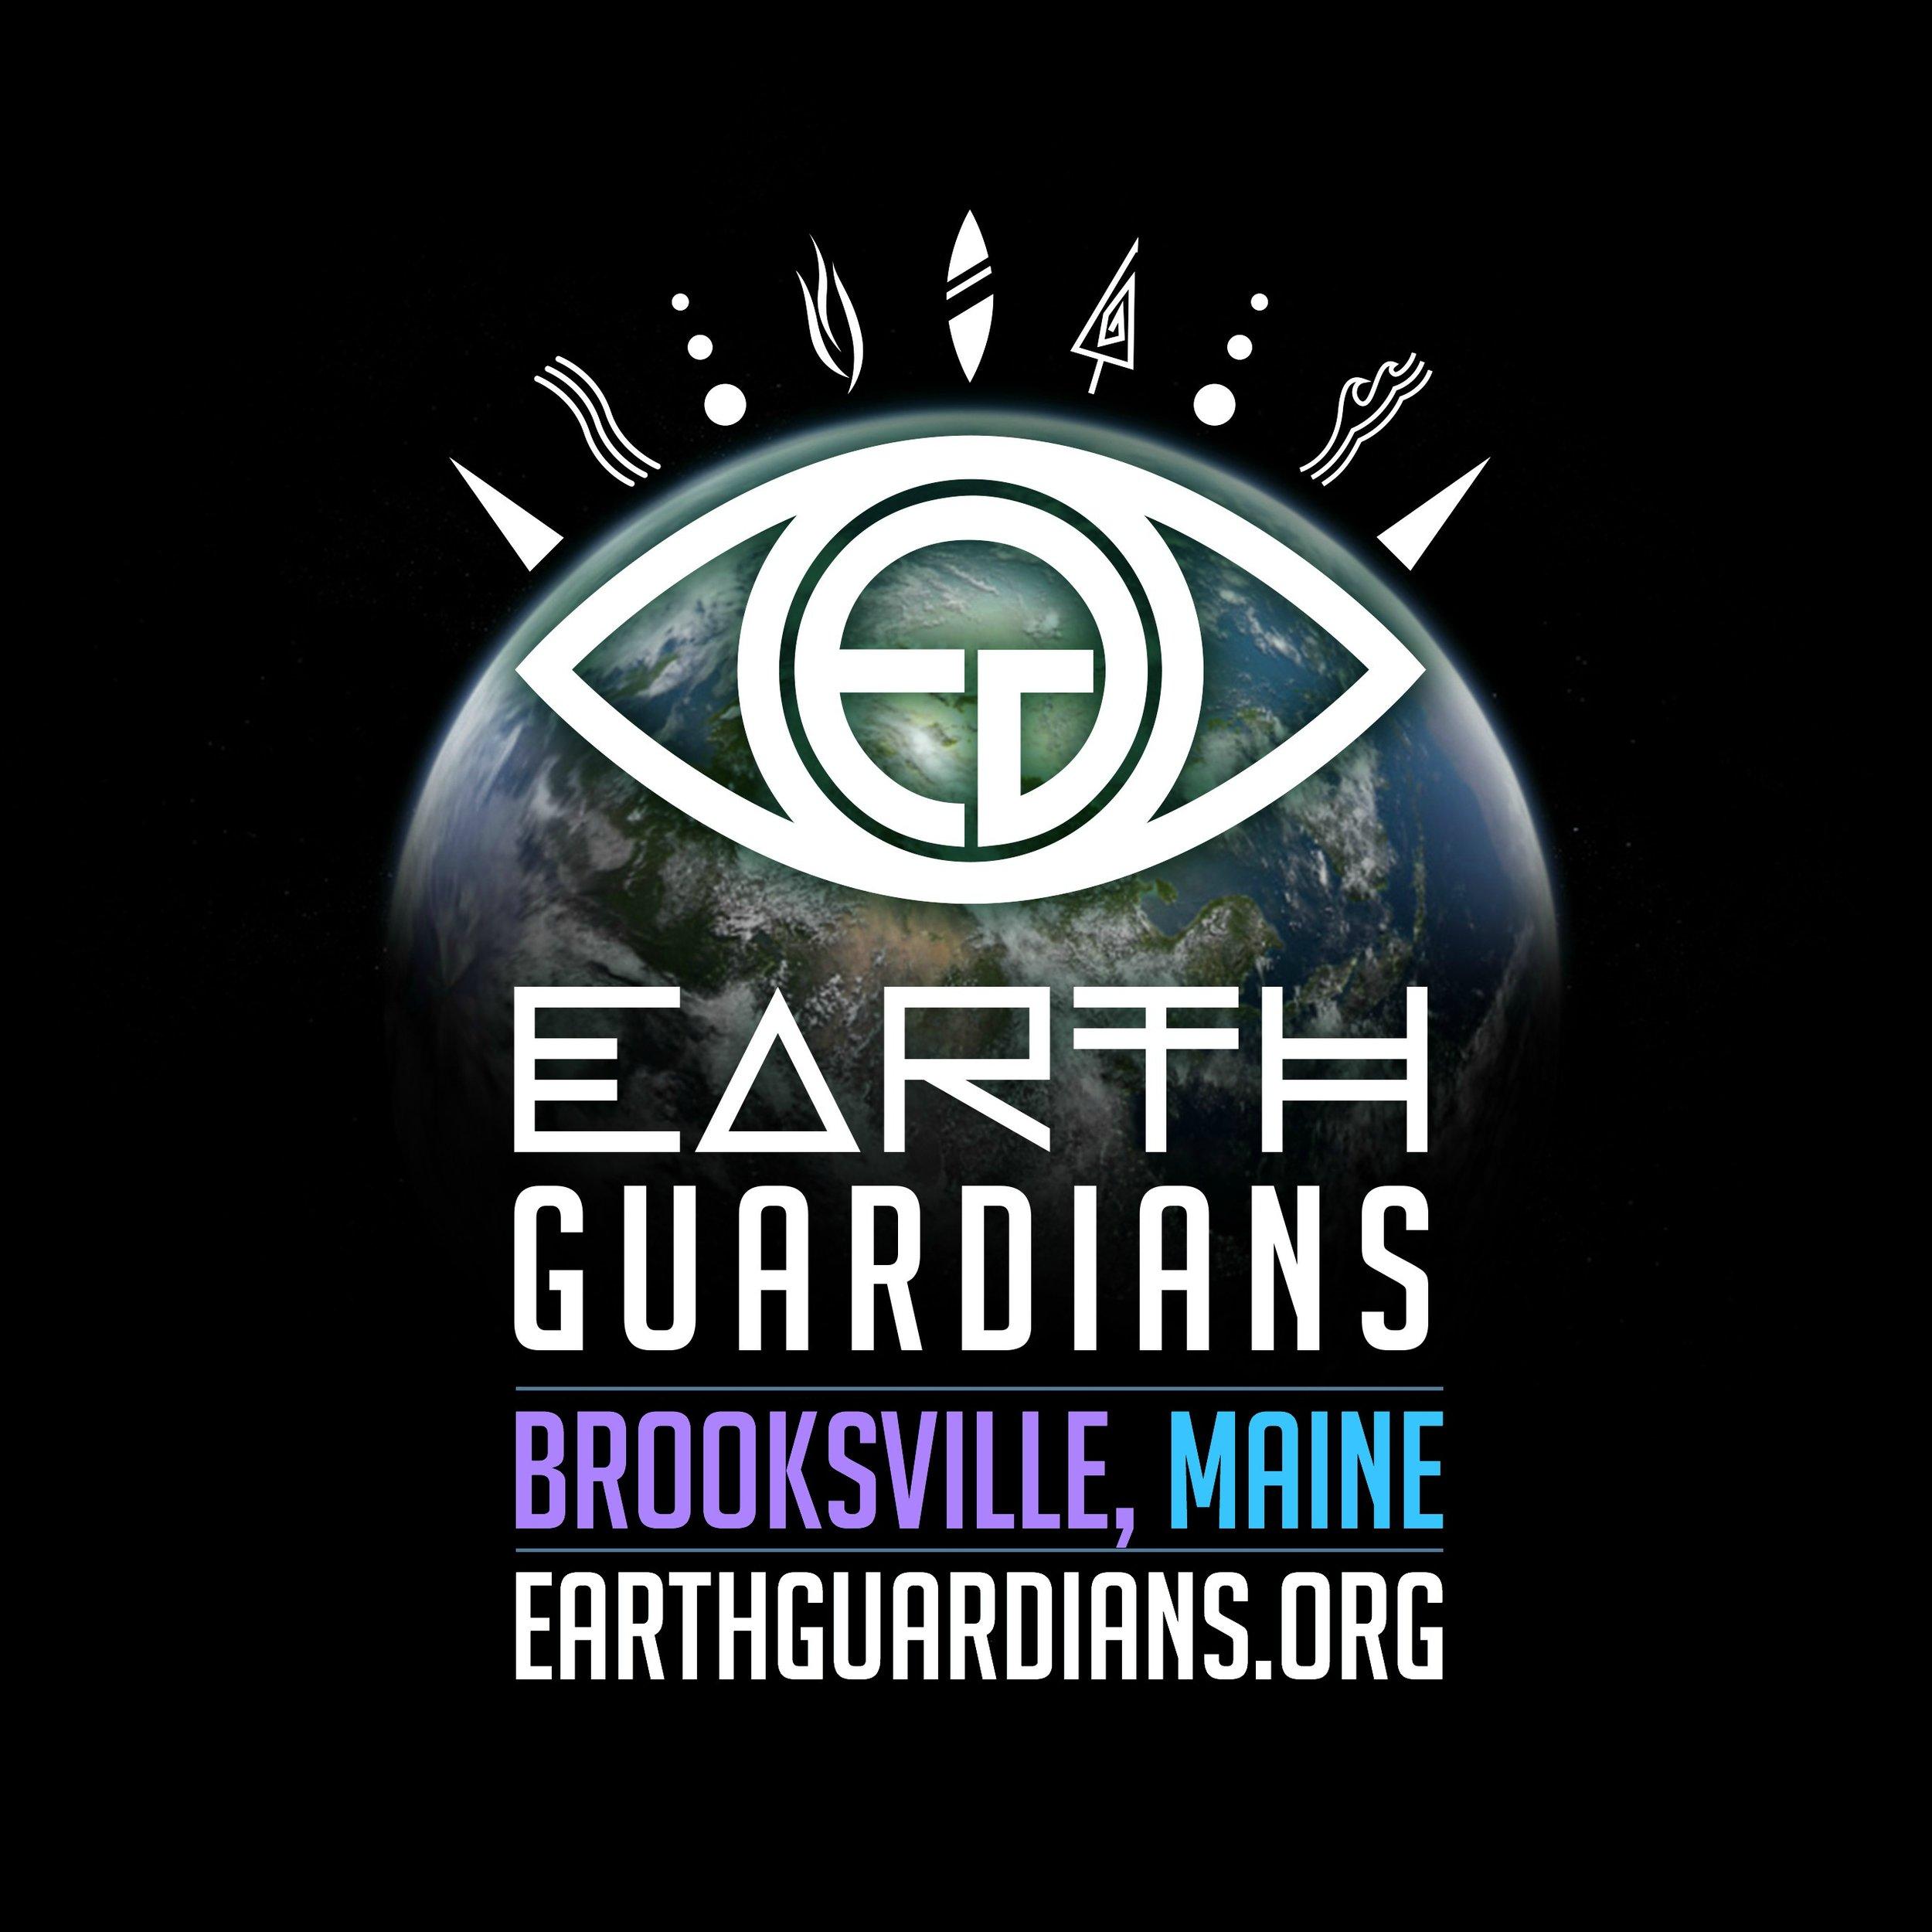 EG_crew logoBROOKSVILLE maine.jpg